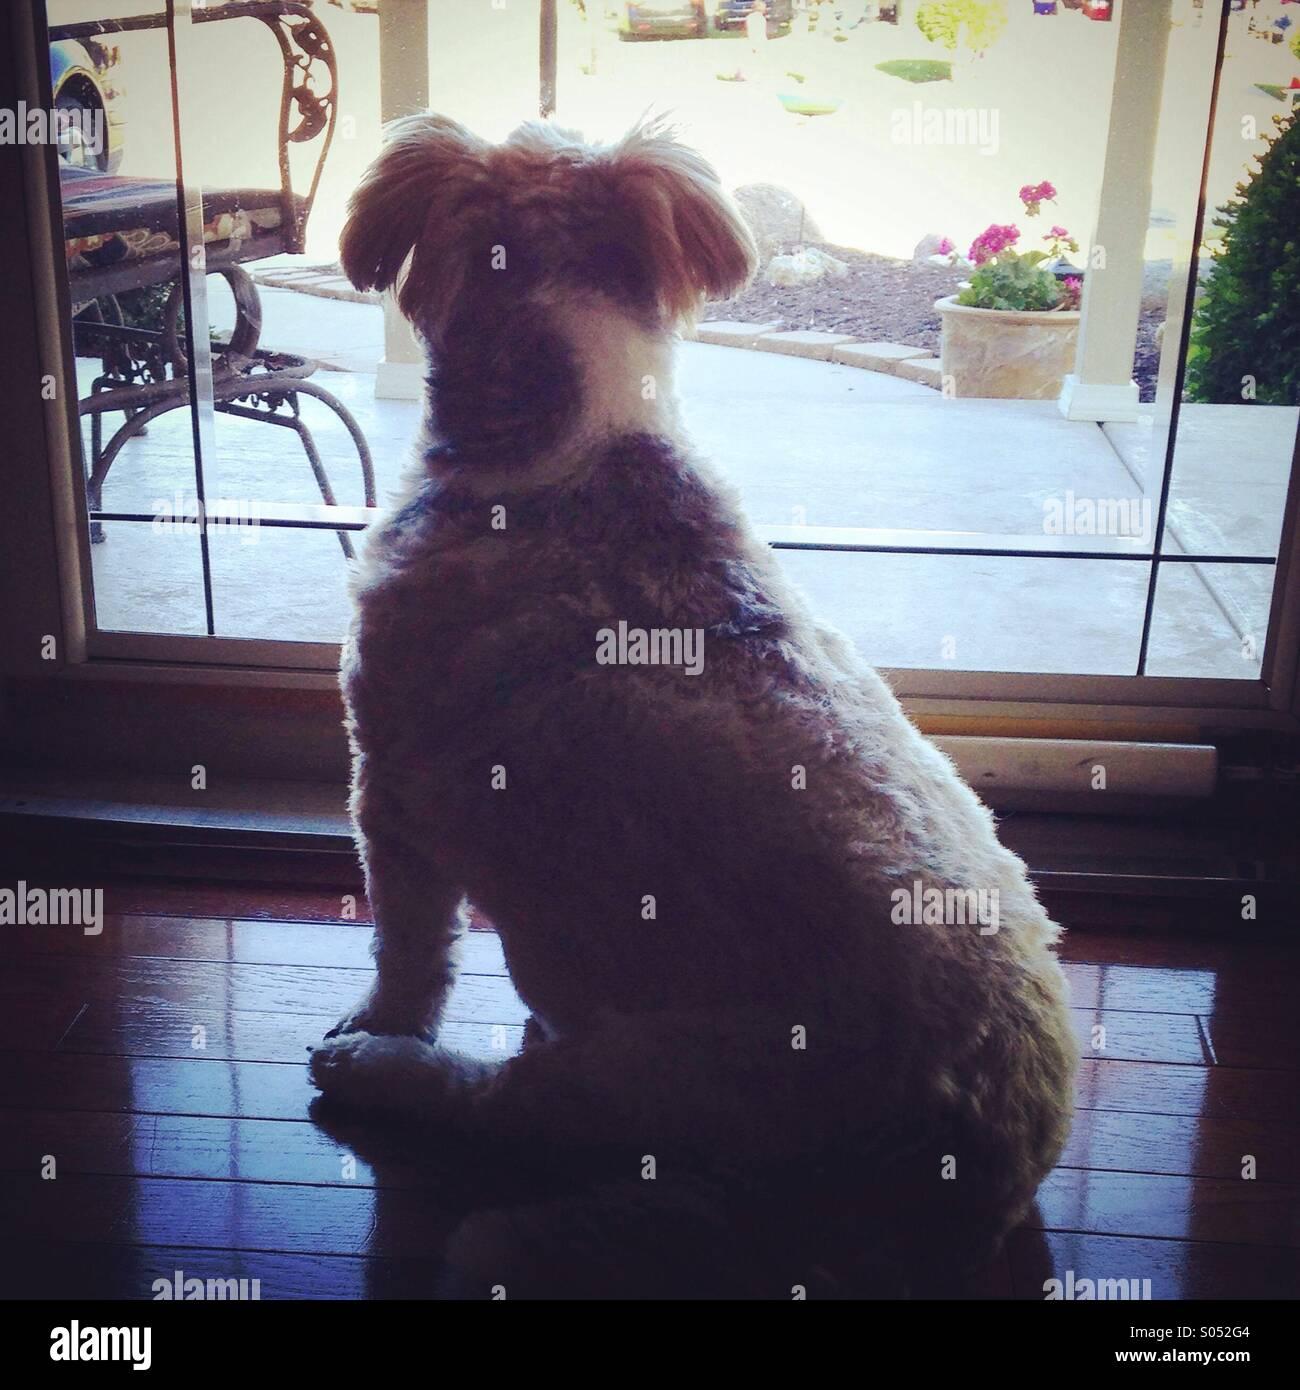 Dog longing to play outside. - Stock Image